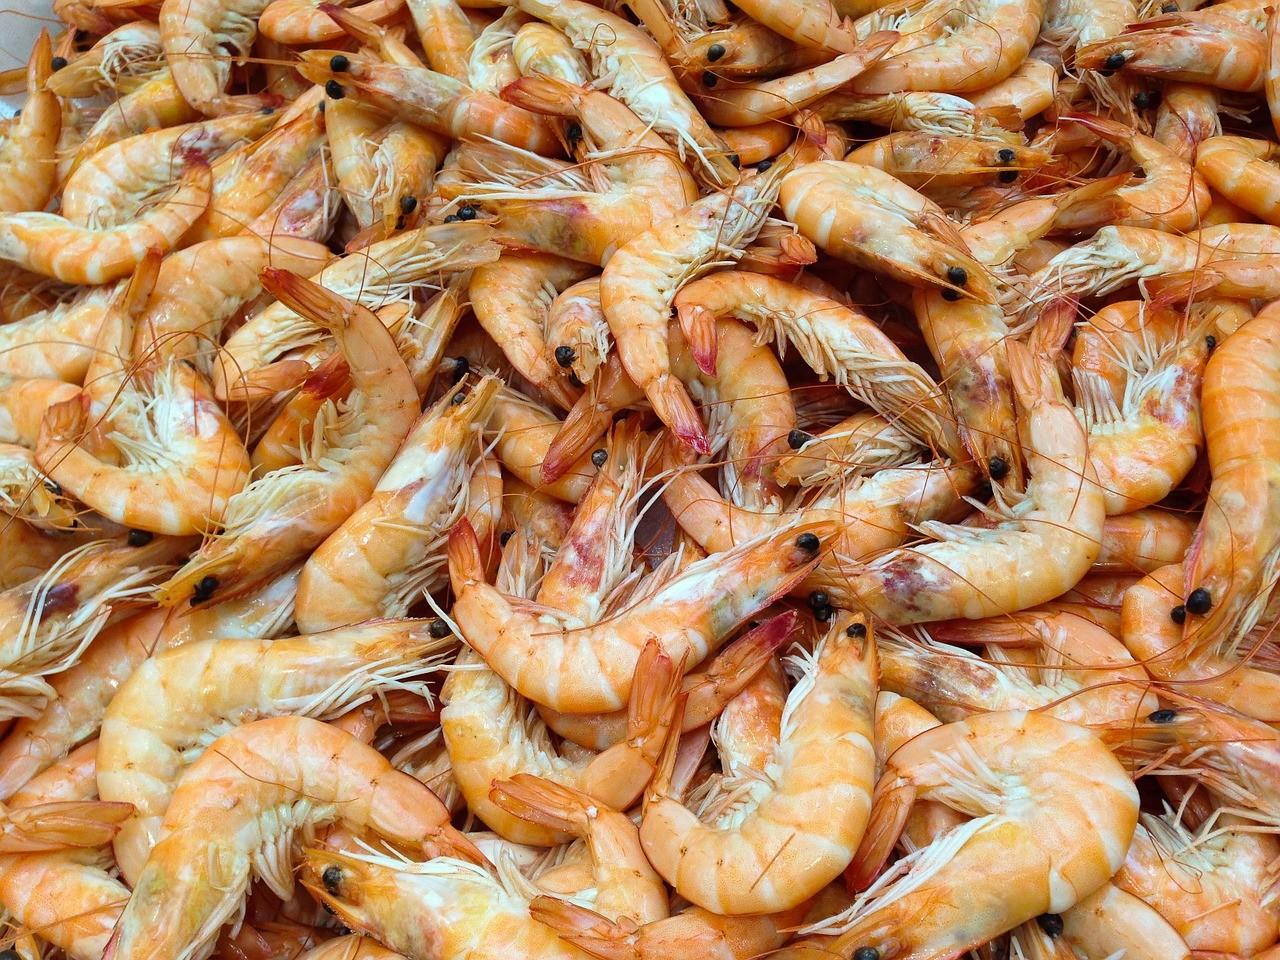 camarao-crustaceos (Foto: Creative Commons/Jacqueline Macou)